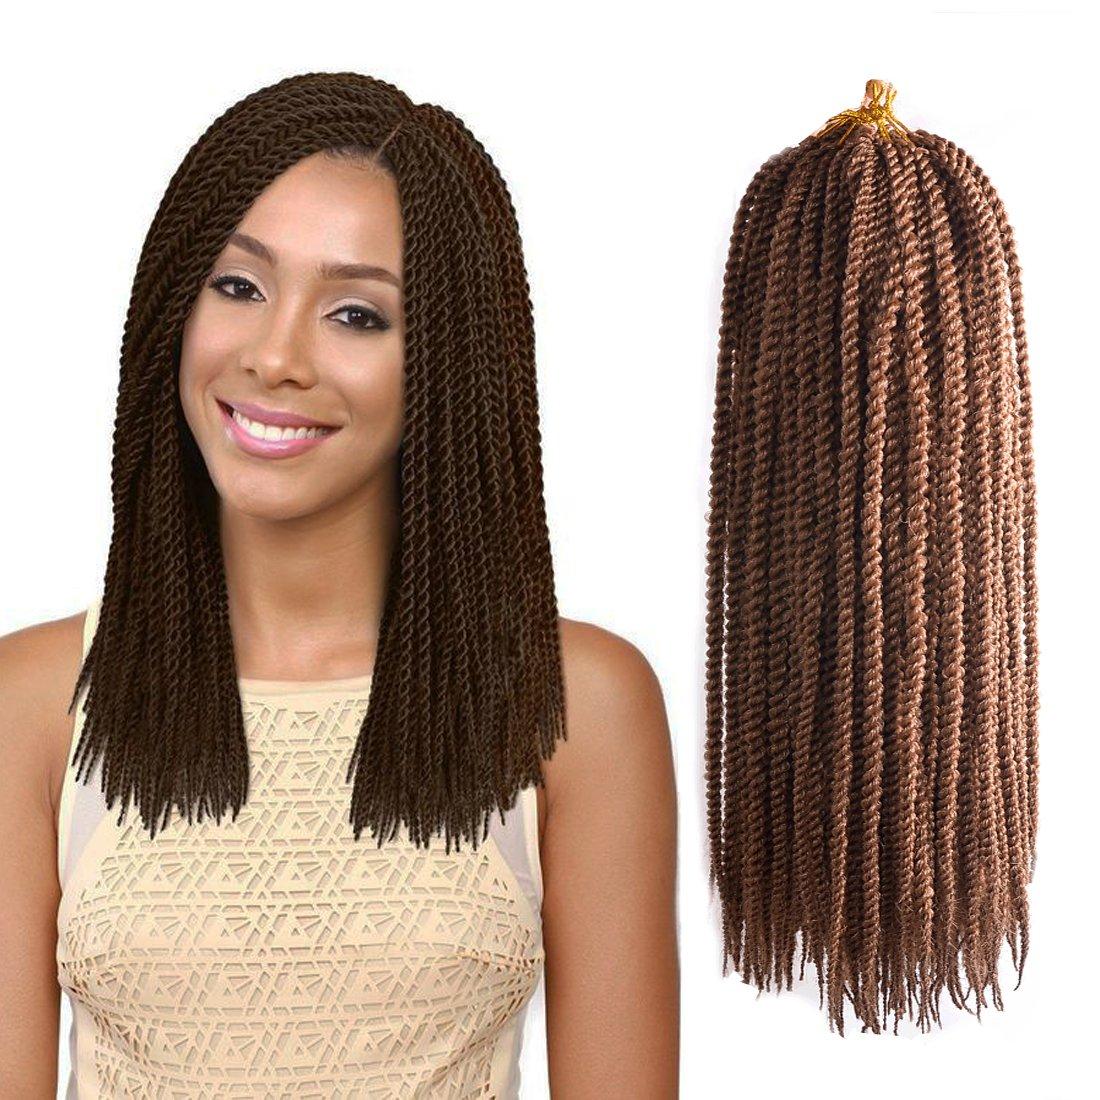 Best Hair Extensions Urqueen Ombre Senegalese Crochet Braids6 Pack